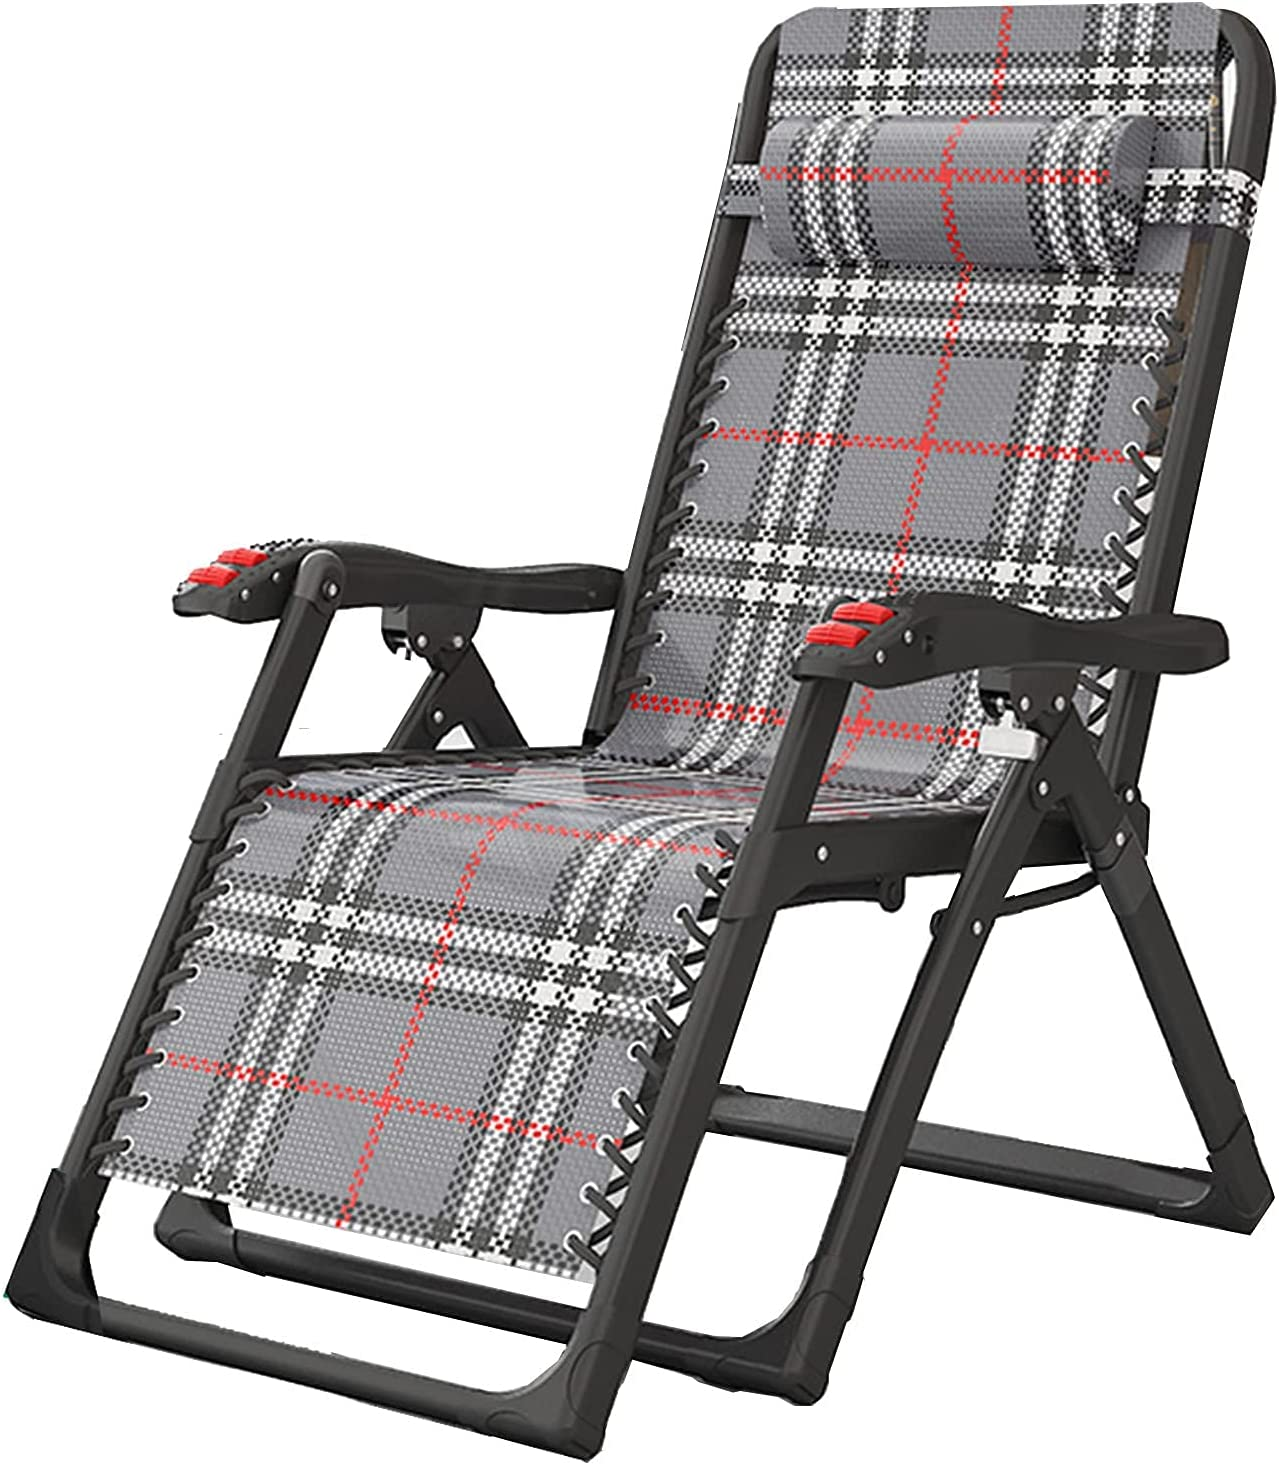 WYDM Tumbona Plegable portátil, Silla de salón para balcón Tumbona de jardín, con reposacabezas extraíble y Rejilla de Tubo Grueso, sillón de Ocio con Respaldo Ajustable, Carga 200 kg (Color: B)